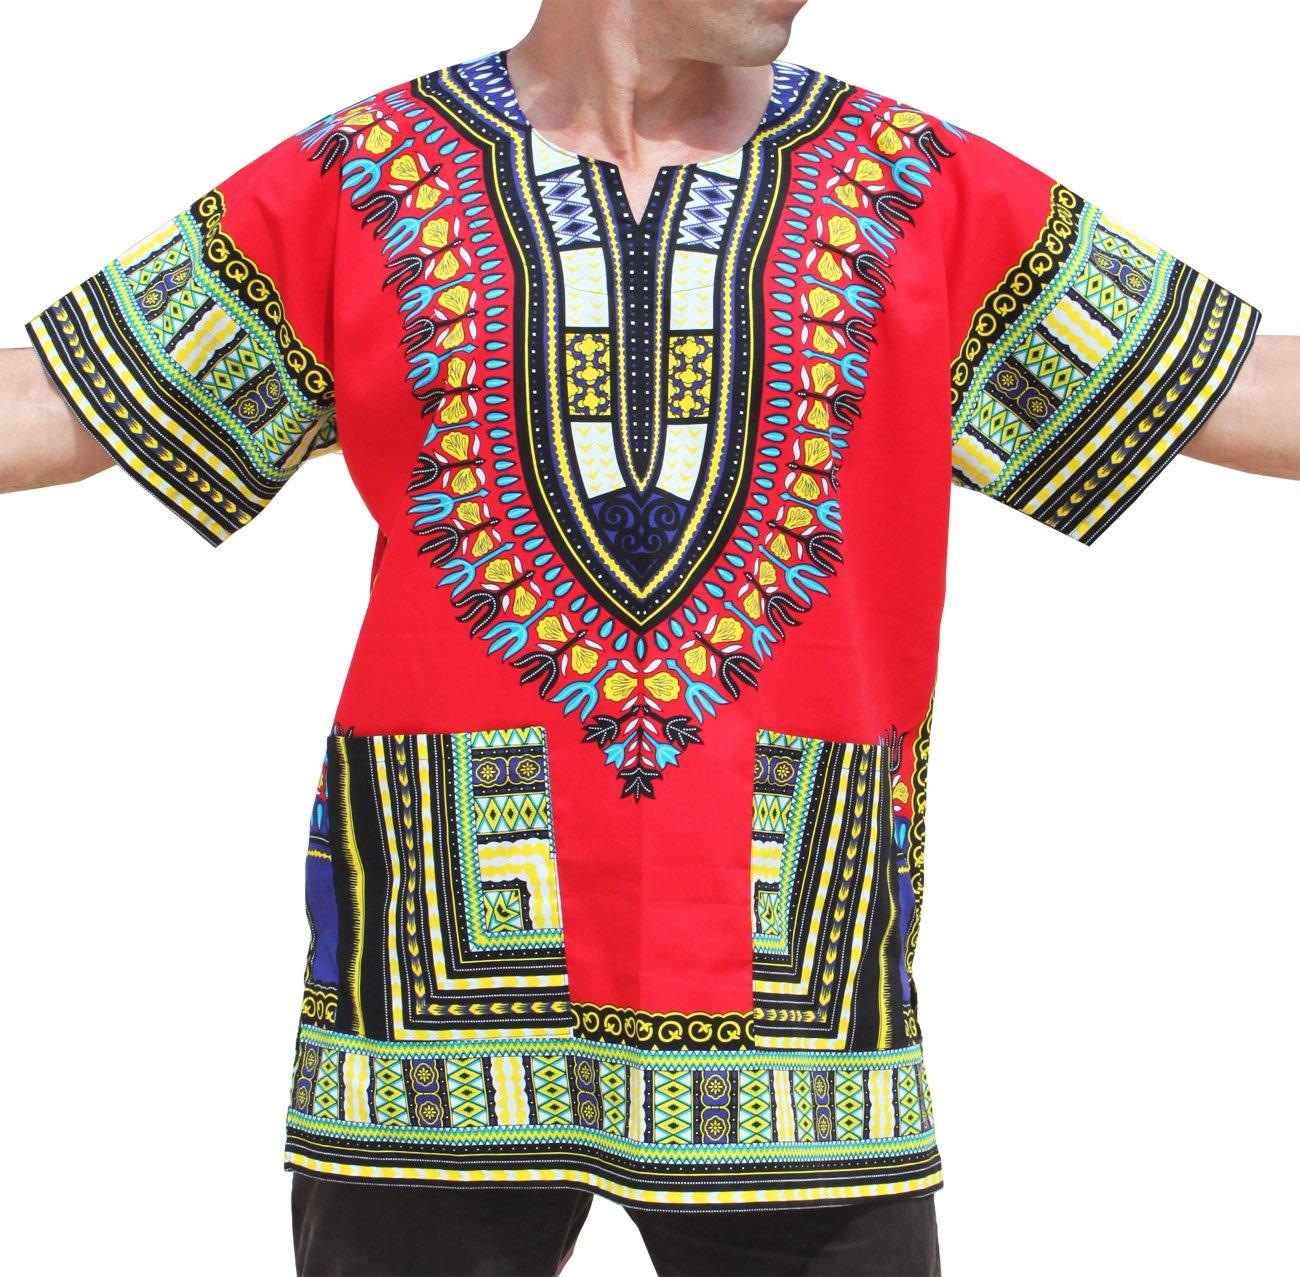 RaanPahMuang Unisex African Bright Dashiki Cotton Shirt Variety Colors #20,LT RED, L